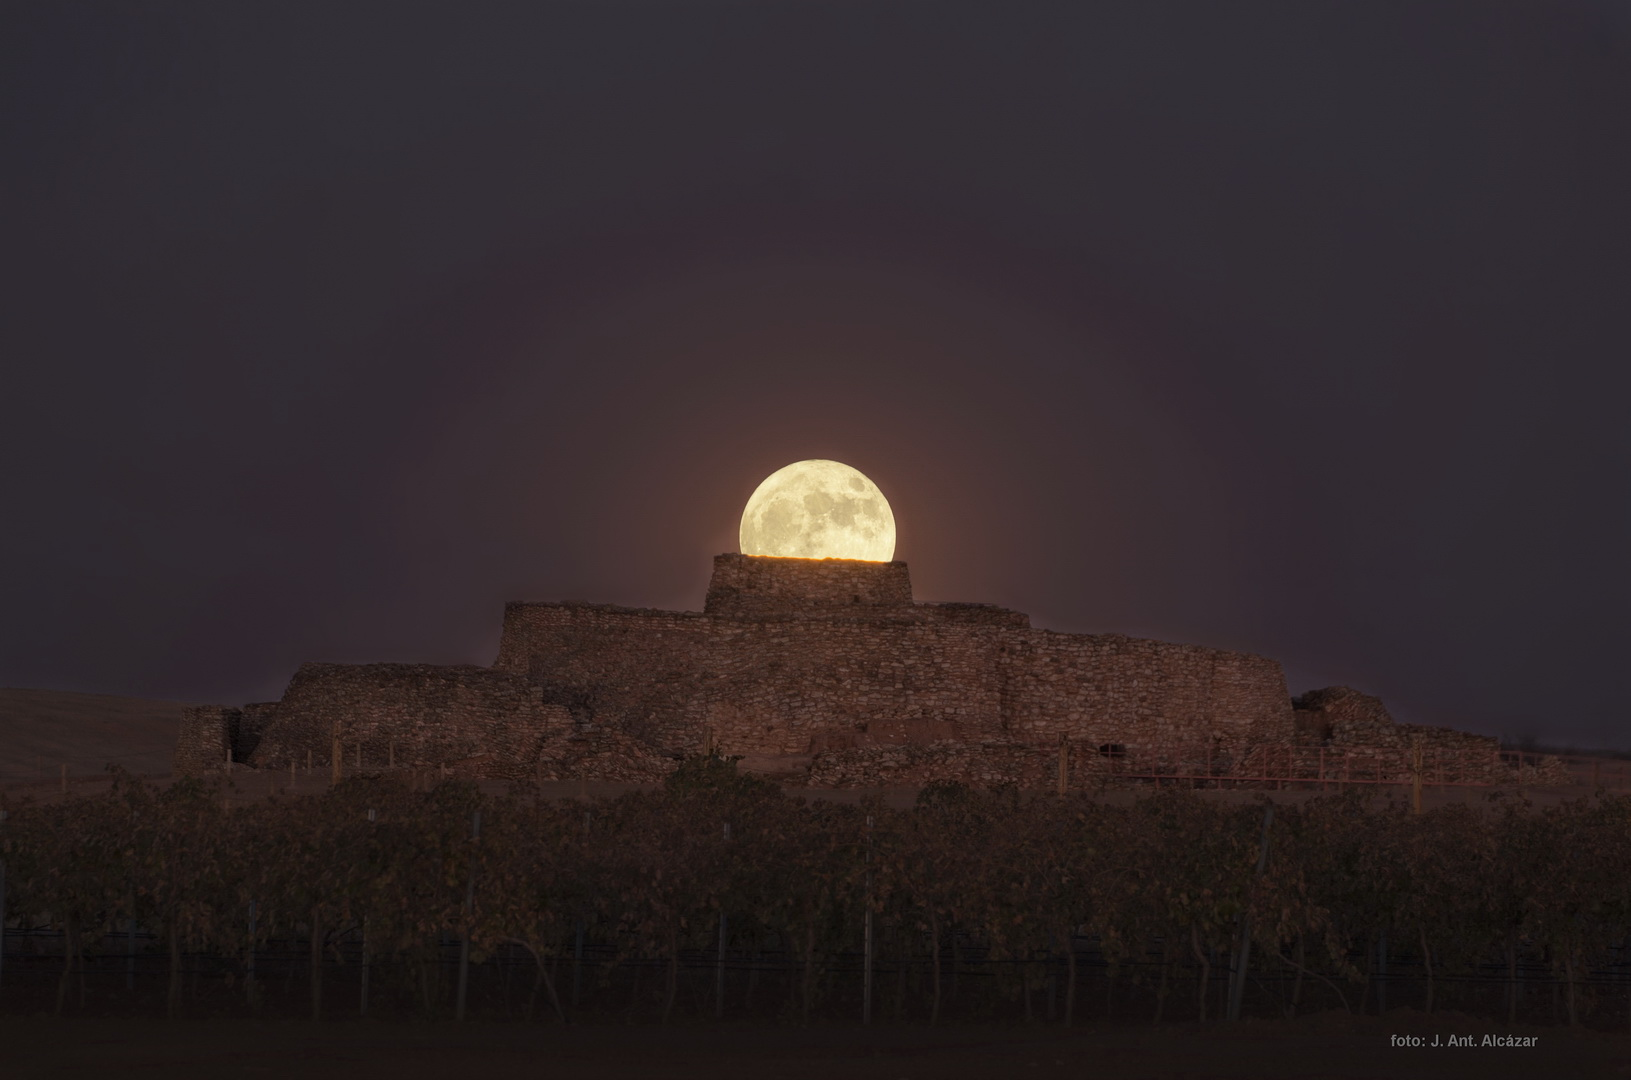 Luna Llena en la Motilla del Azuer